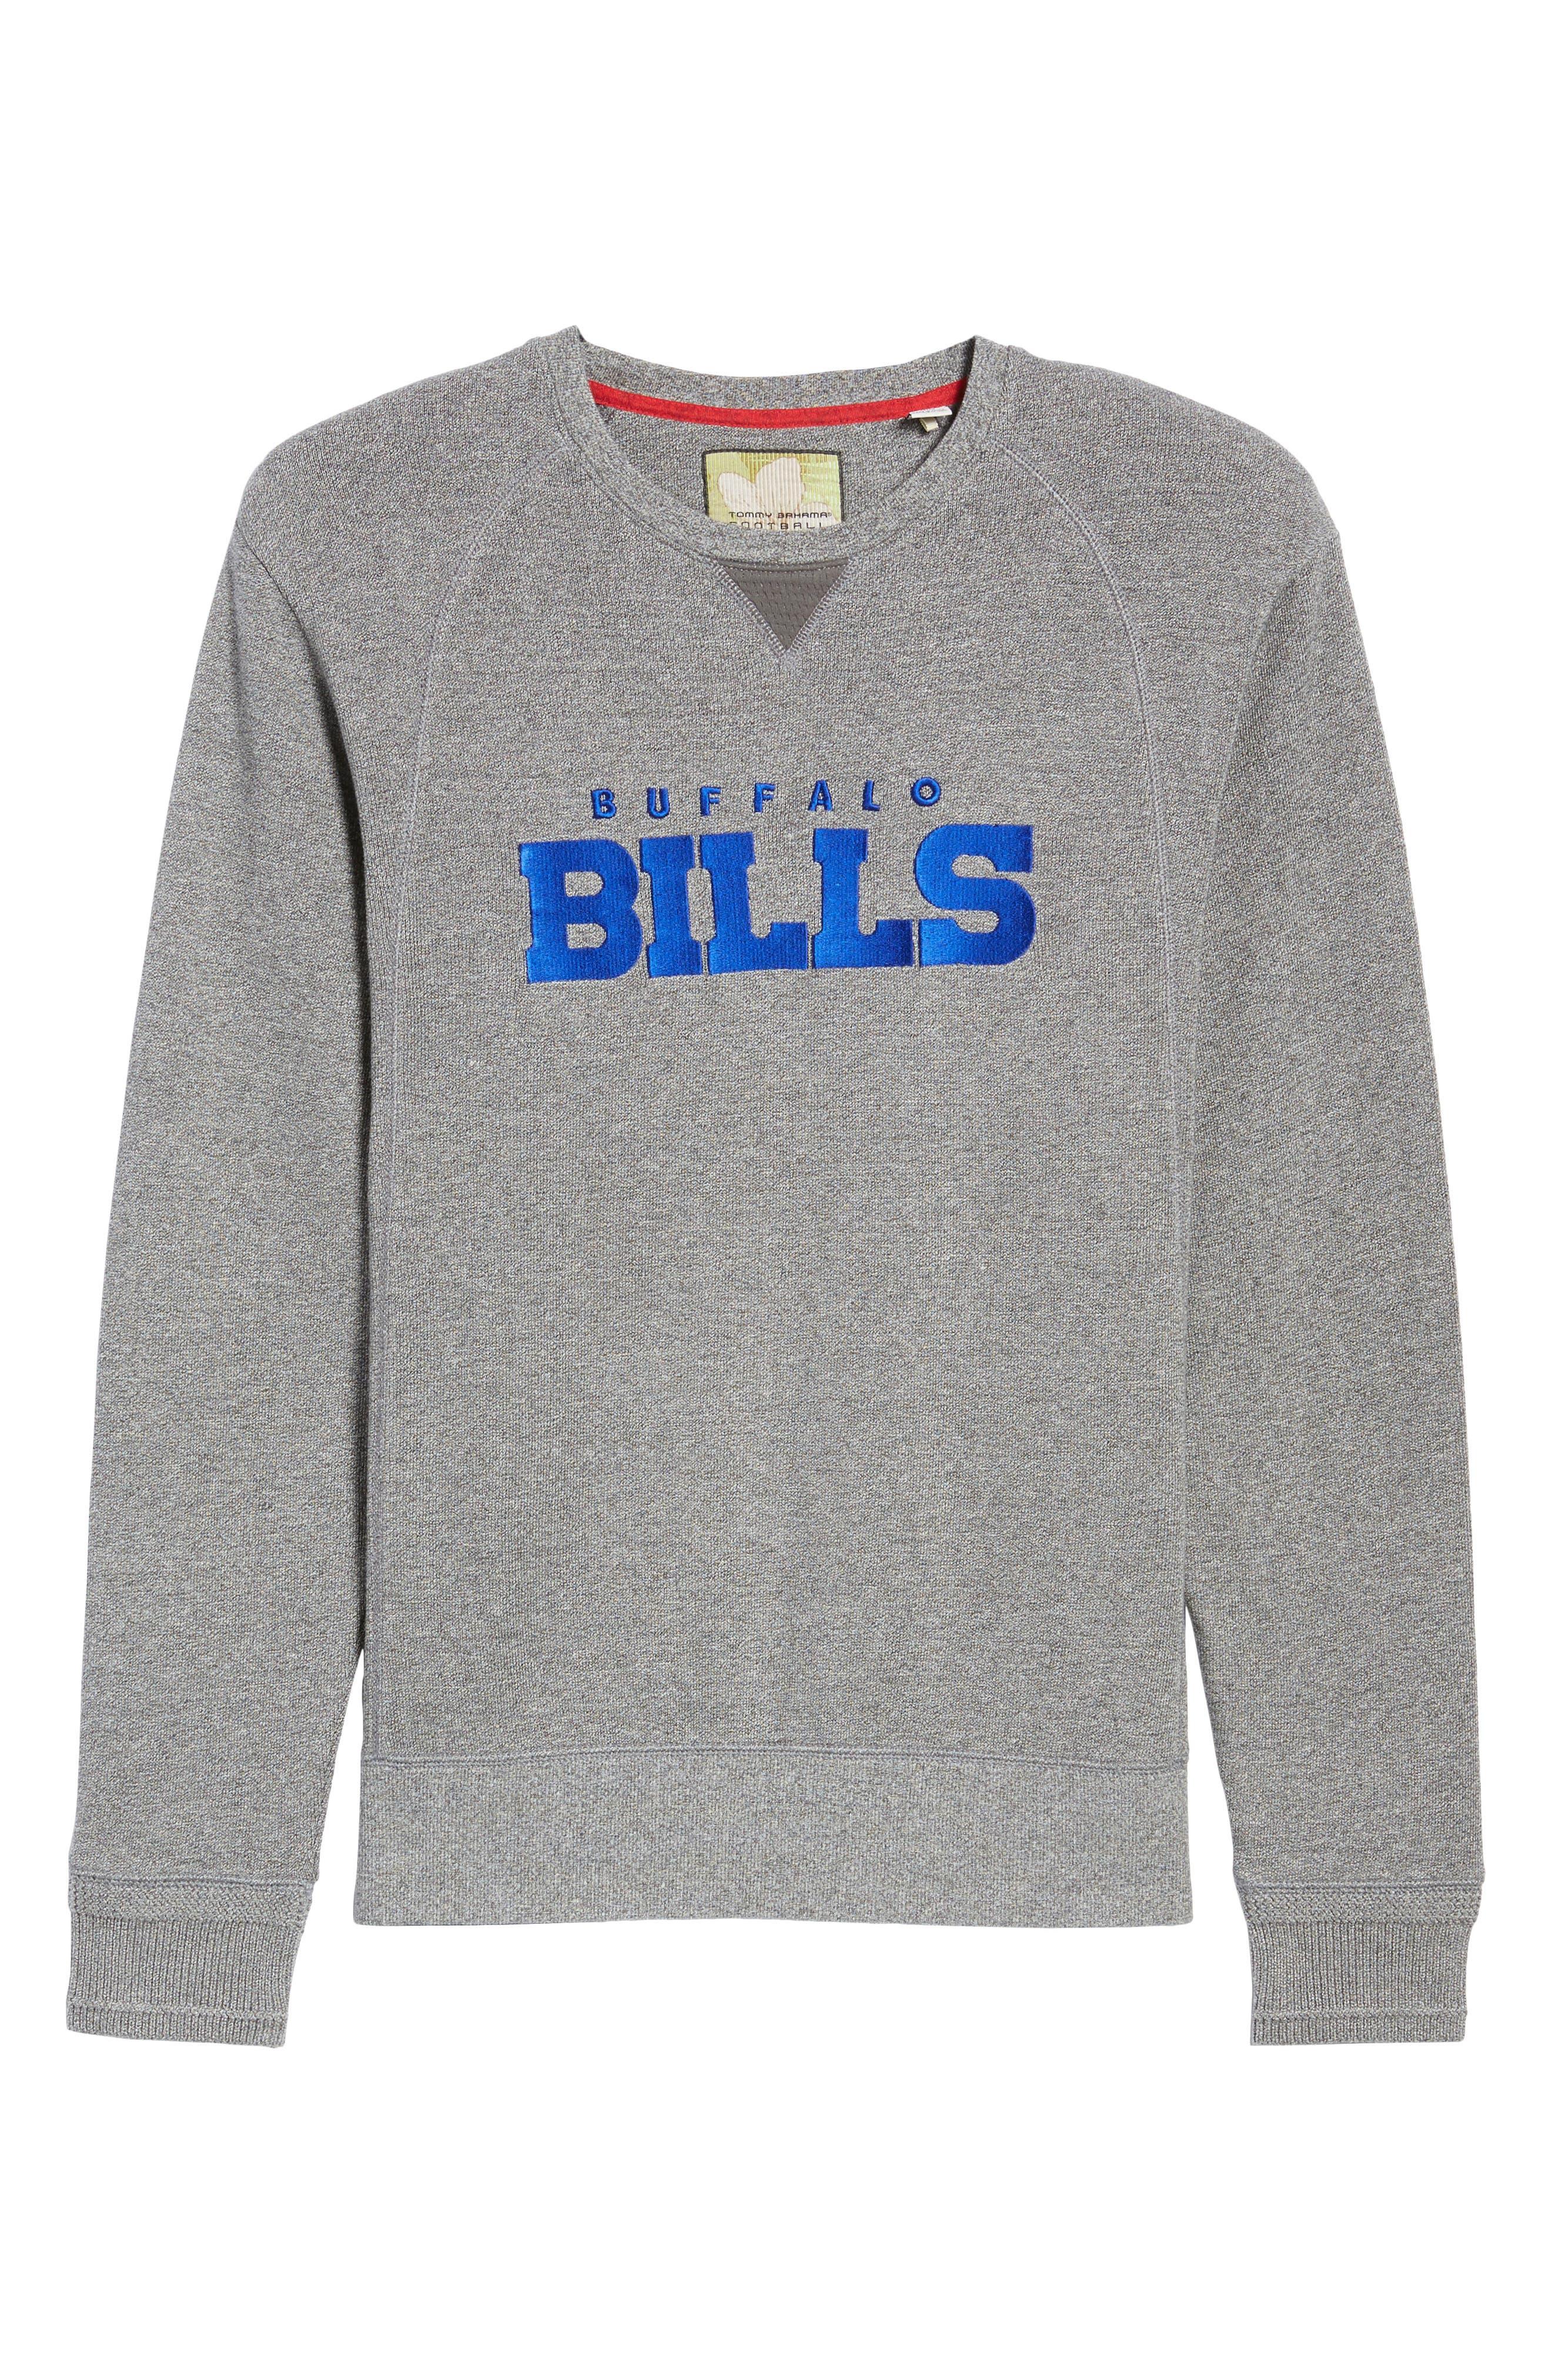 NFL Stitch of Liberty Embroidered Crewneck Sweatshirt,                             Alternate thumbnail 157, color,